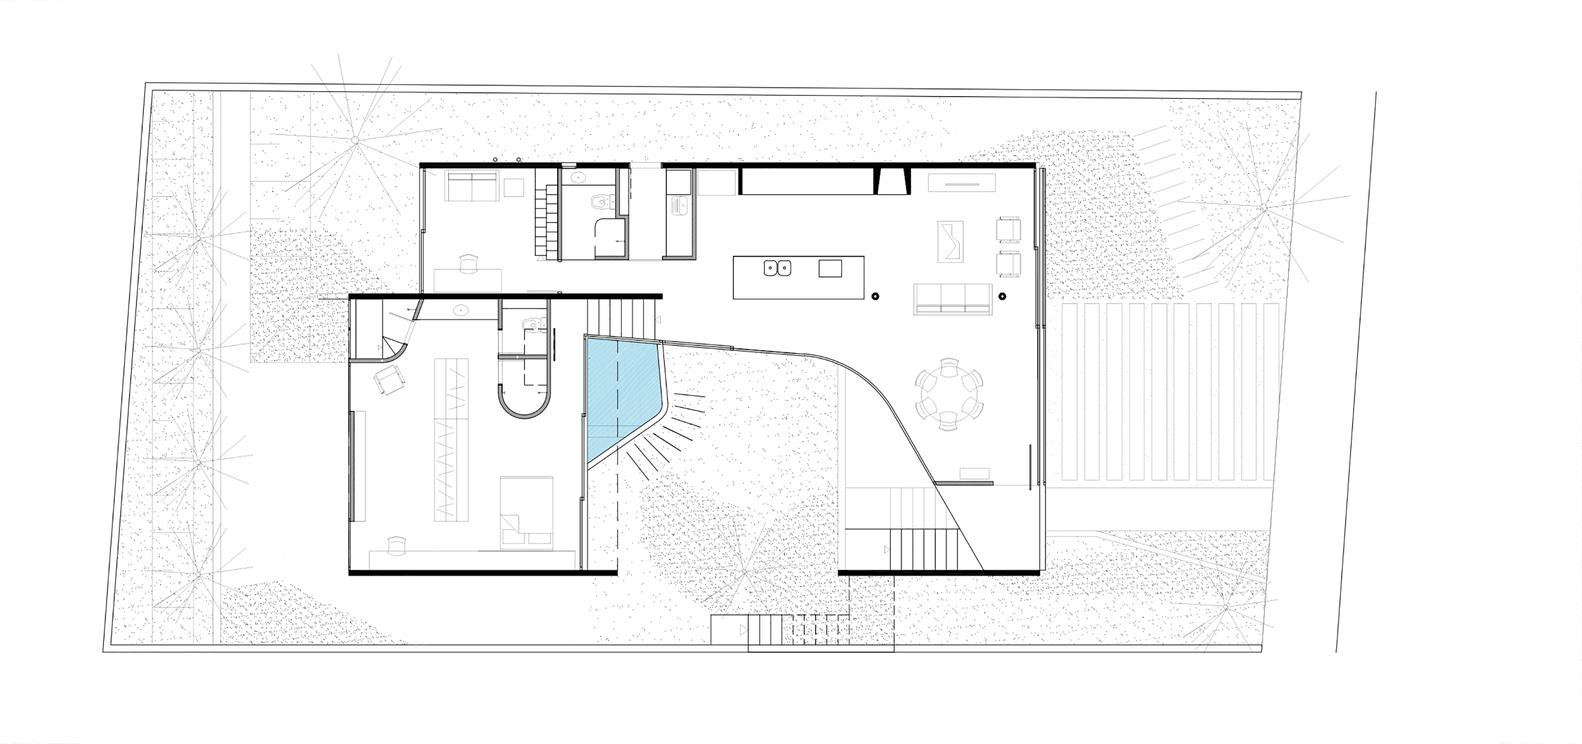 Gallery of lens house obra arquitetos 22 lens housefirst floor plan ccuart Gallery